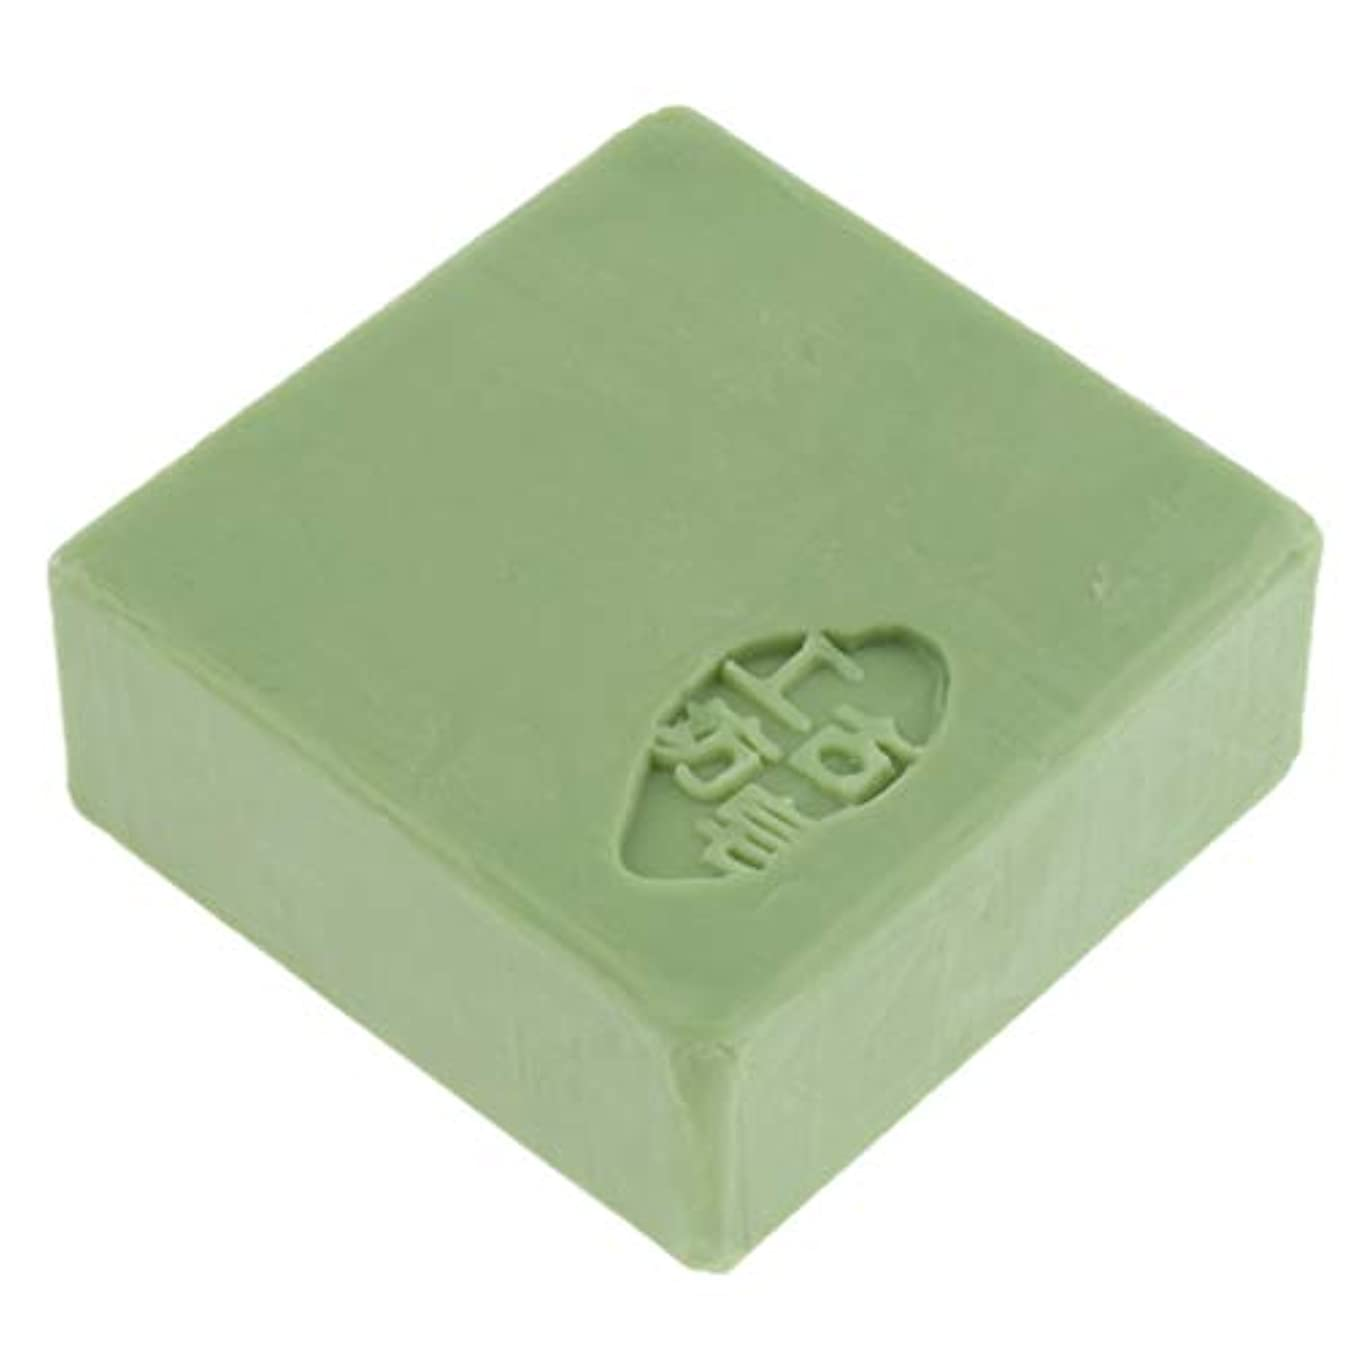 P Prettyia 全3色 バス スキンケア フェイス ボディソープ 石鹸 保湿 肌守り - 緑